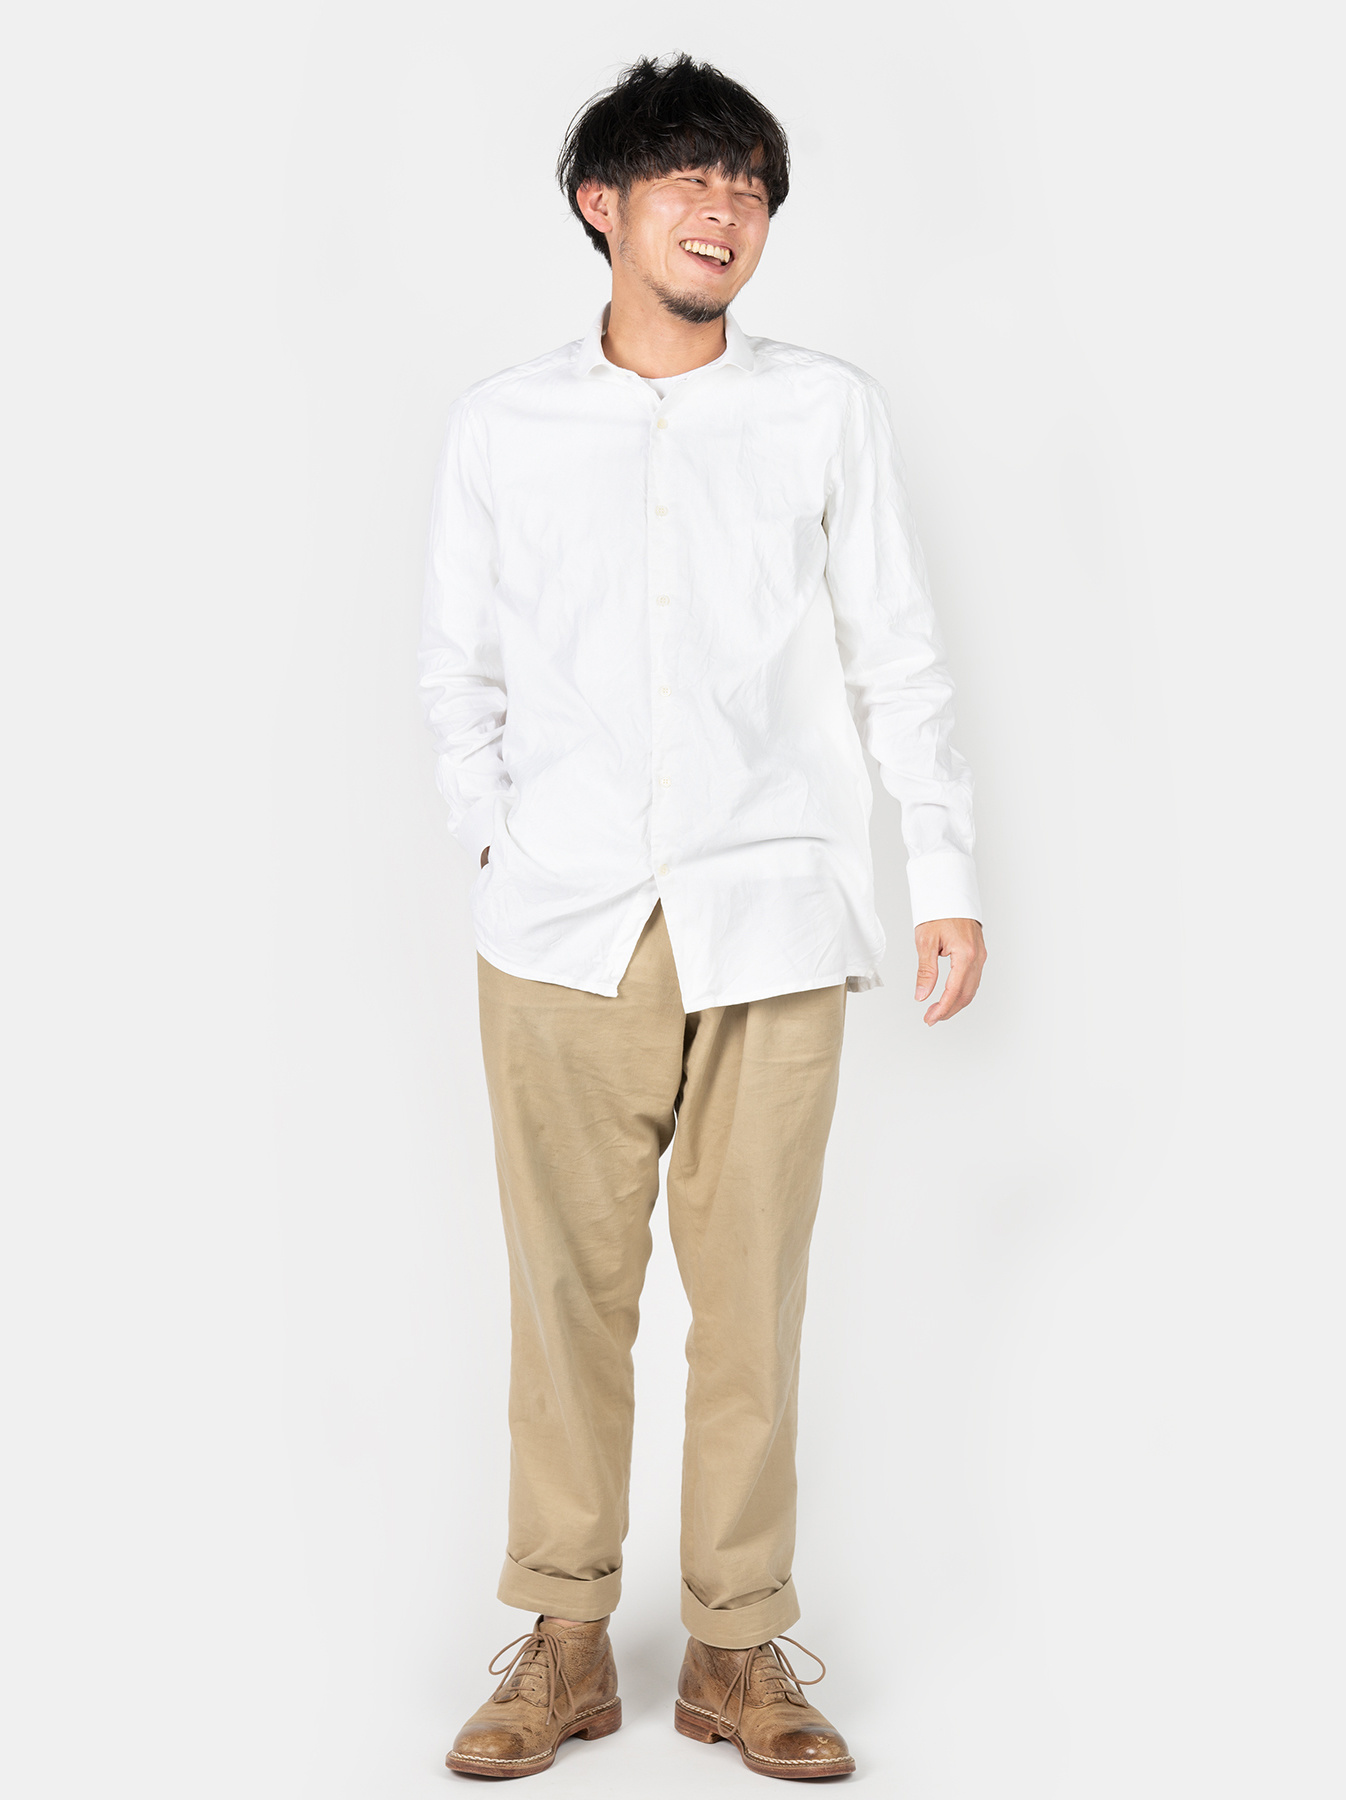 WH Oxford 908 Round Collar Shirt-2